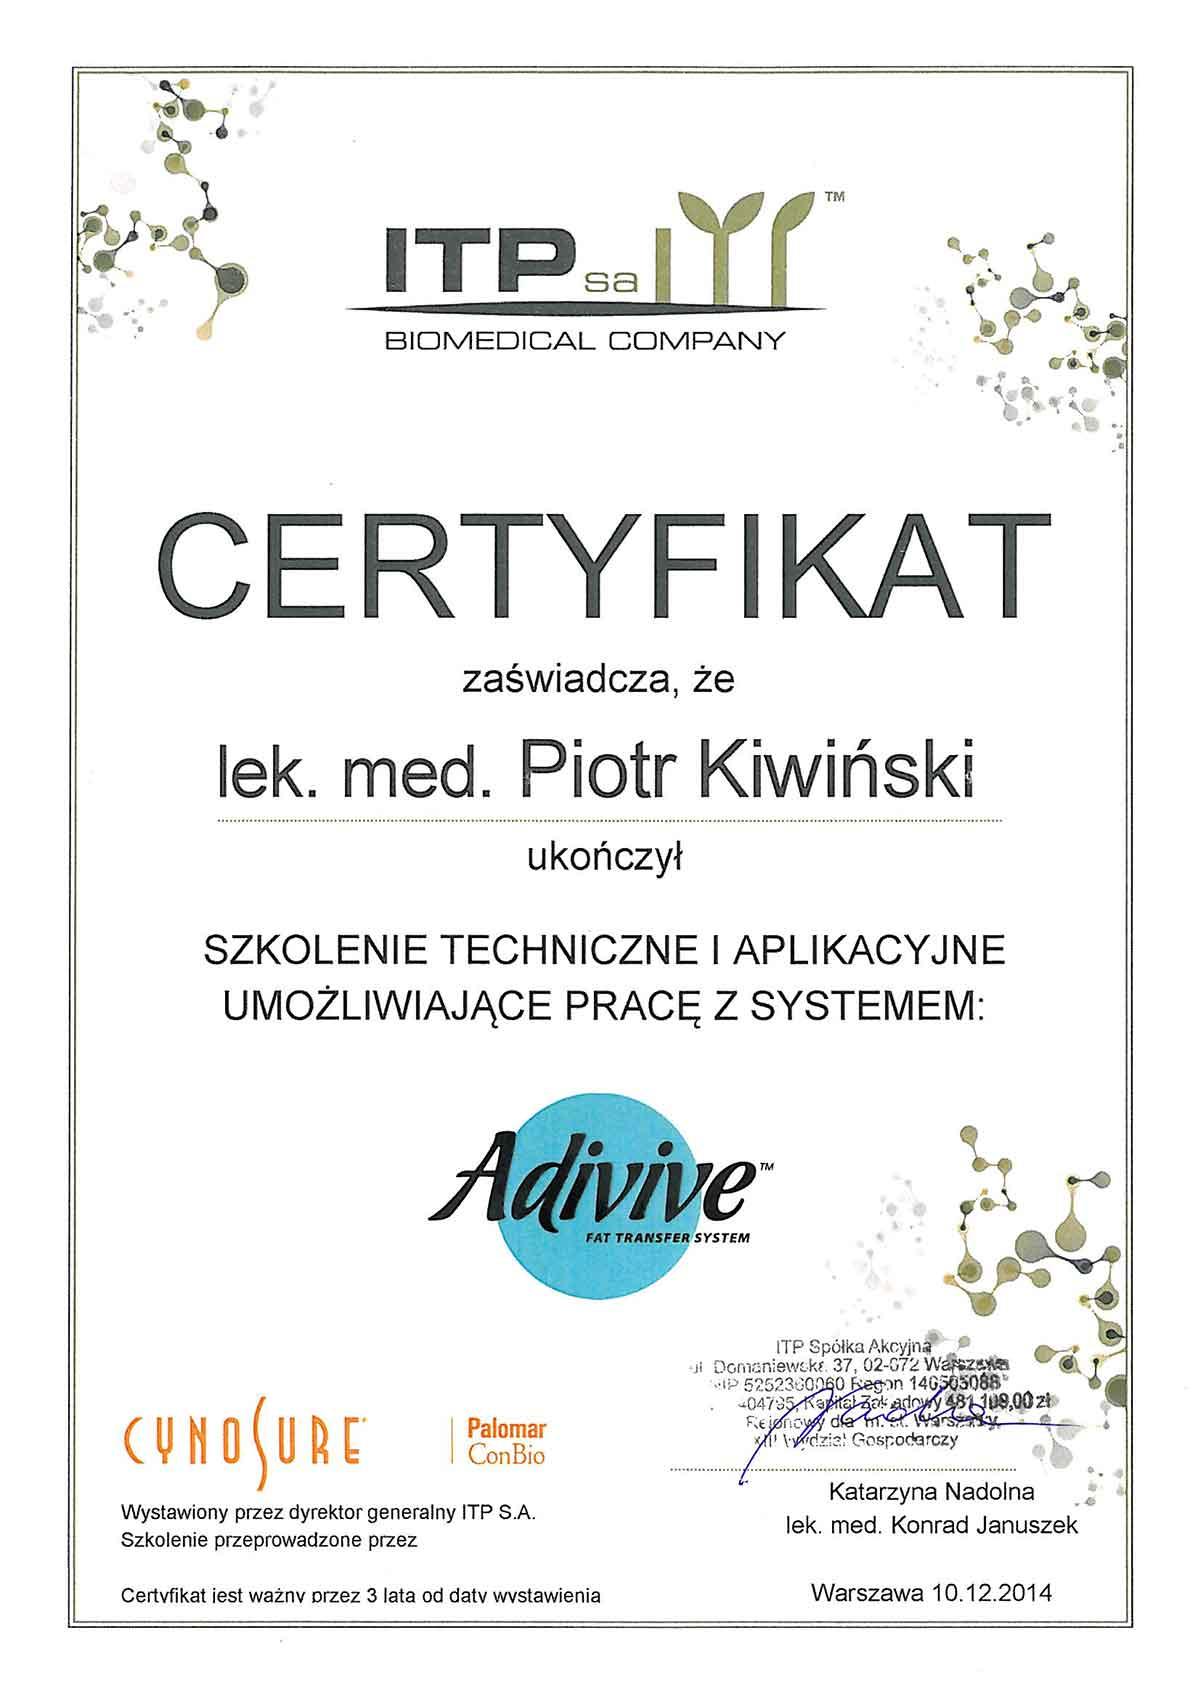 Novena Clinica - certyfikaty i dyplomy. Medycyna estetyczna, chirurgia ogólna i onkologiczna